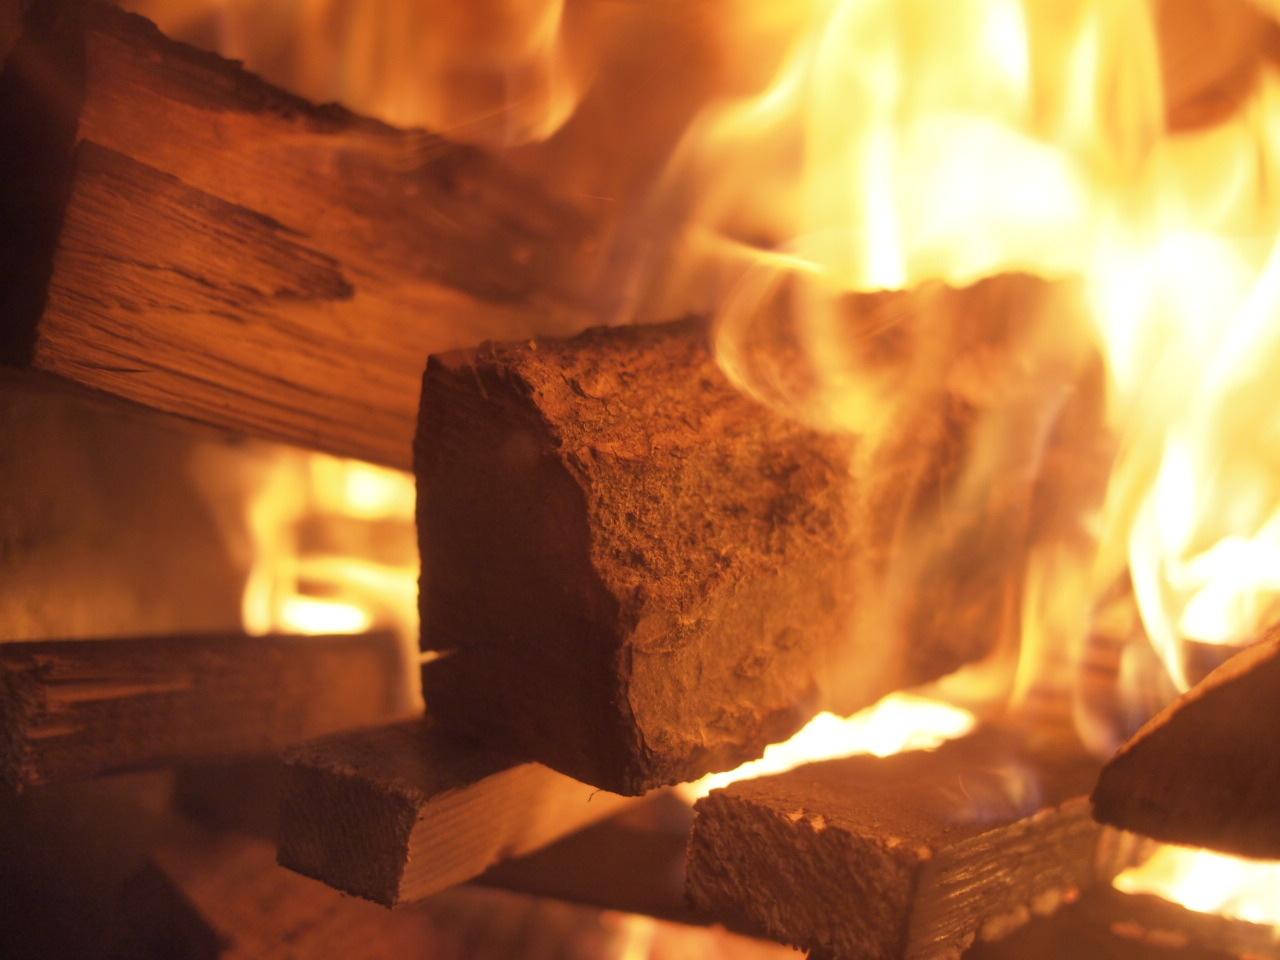 kintoku-stoveの焚き付けの仕方。_a0206732_20001171.jpg